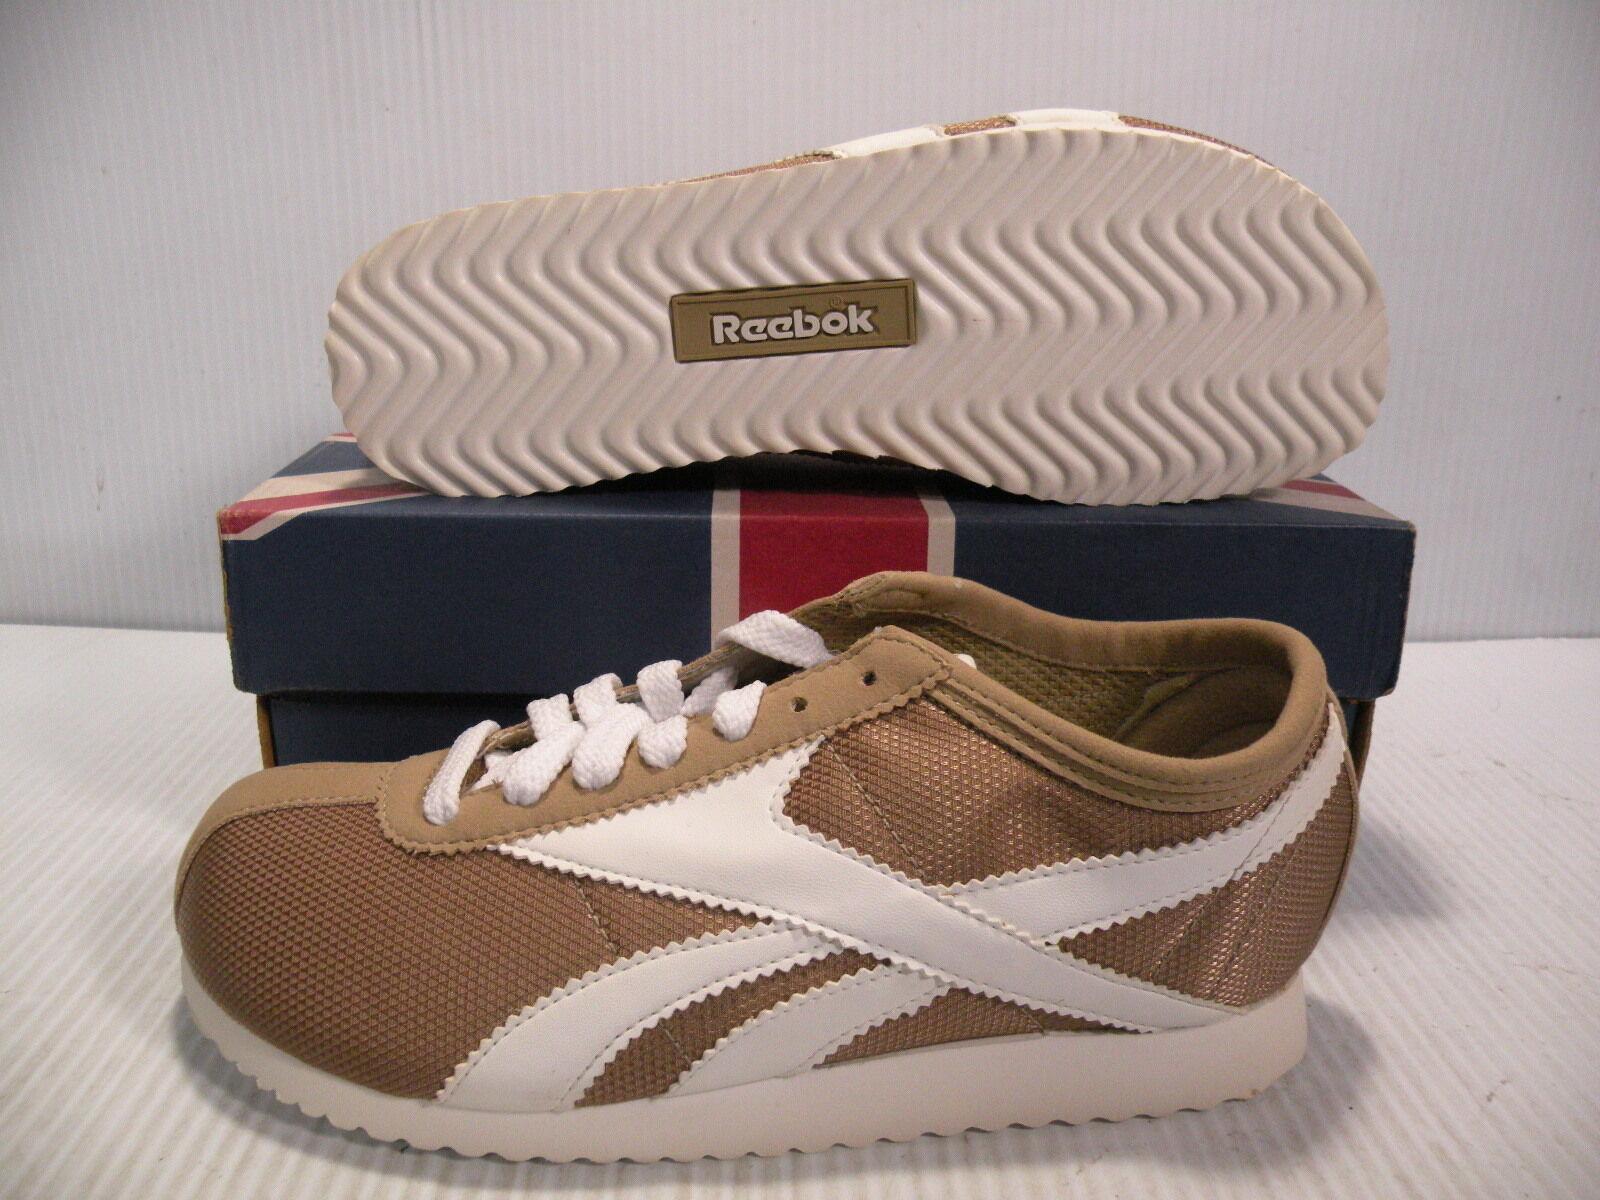 REEBOK CLASSIC MARATHON RACER NYLON LOW WOMEN Schuhe 1-59438 SIZE 8 NEW